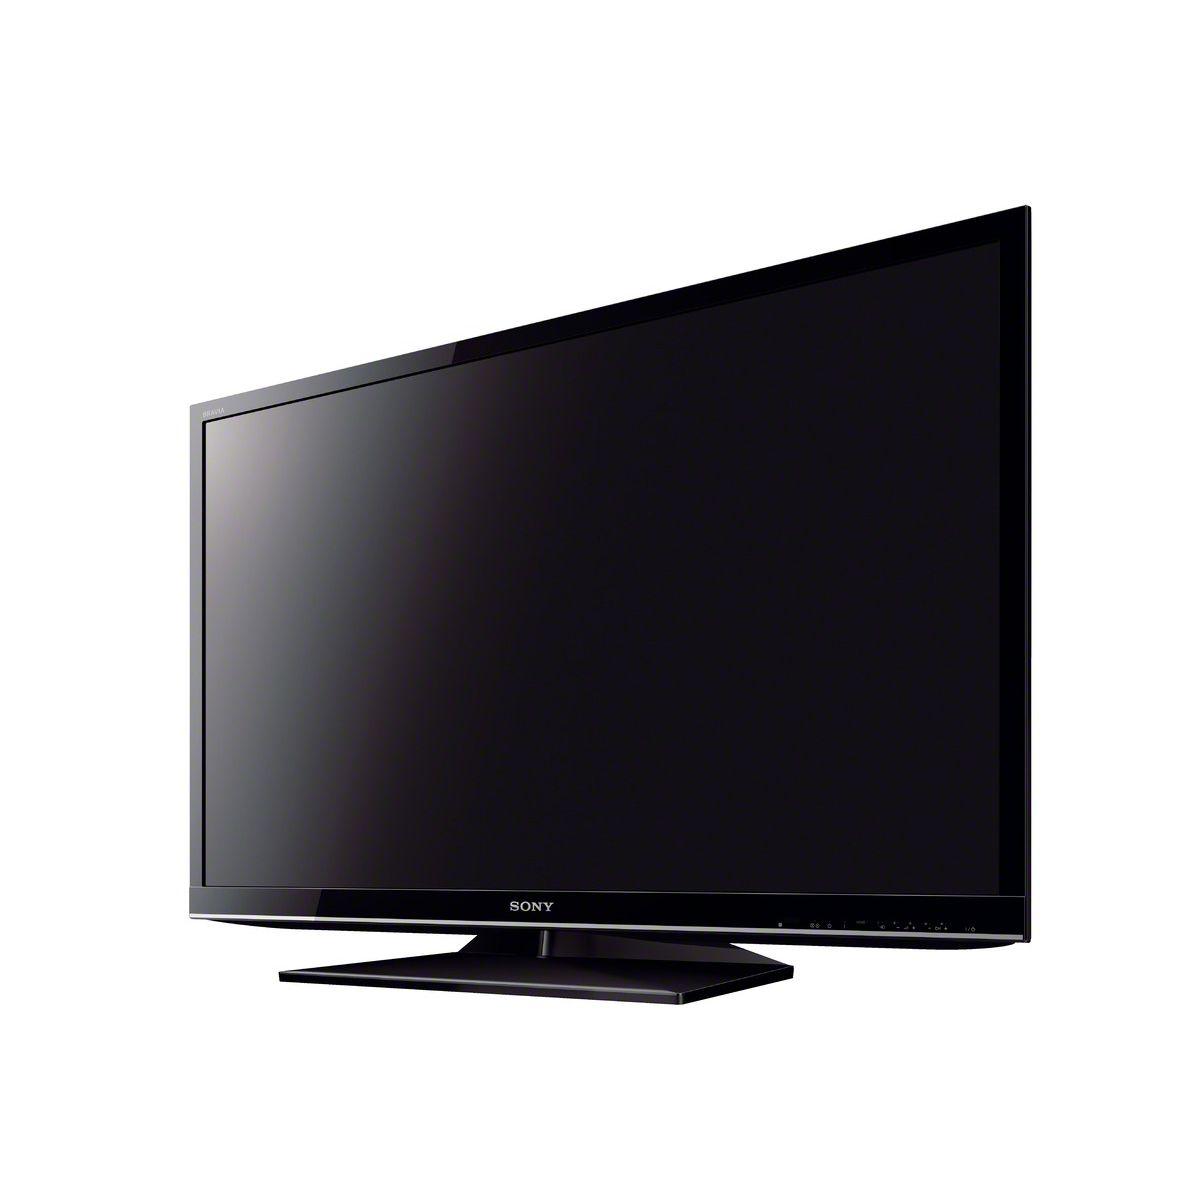 "Sony 42"" Class Bravia 1080p 60Hz LCD HDTV - KDL-42EX440"